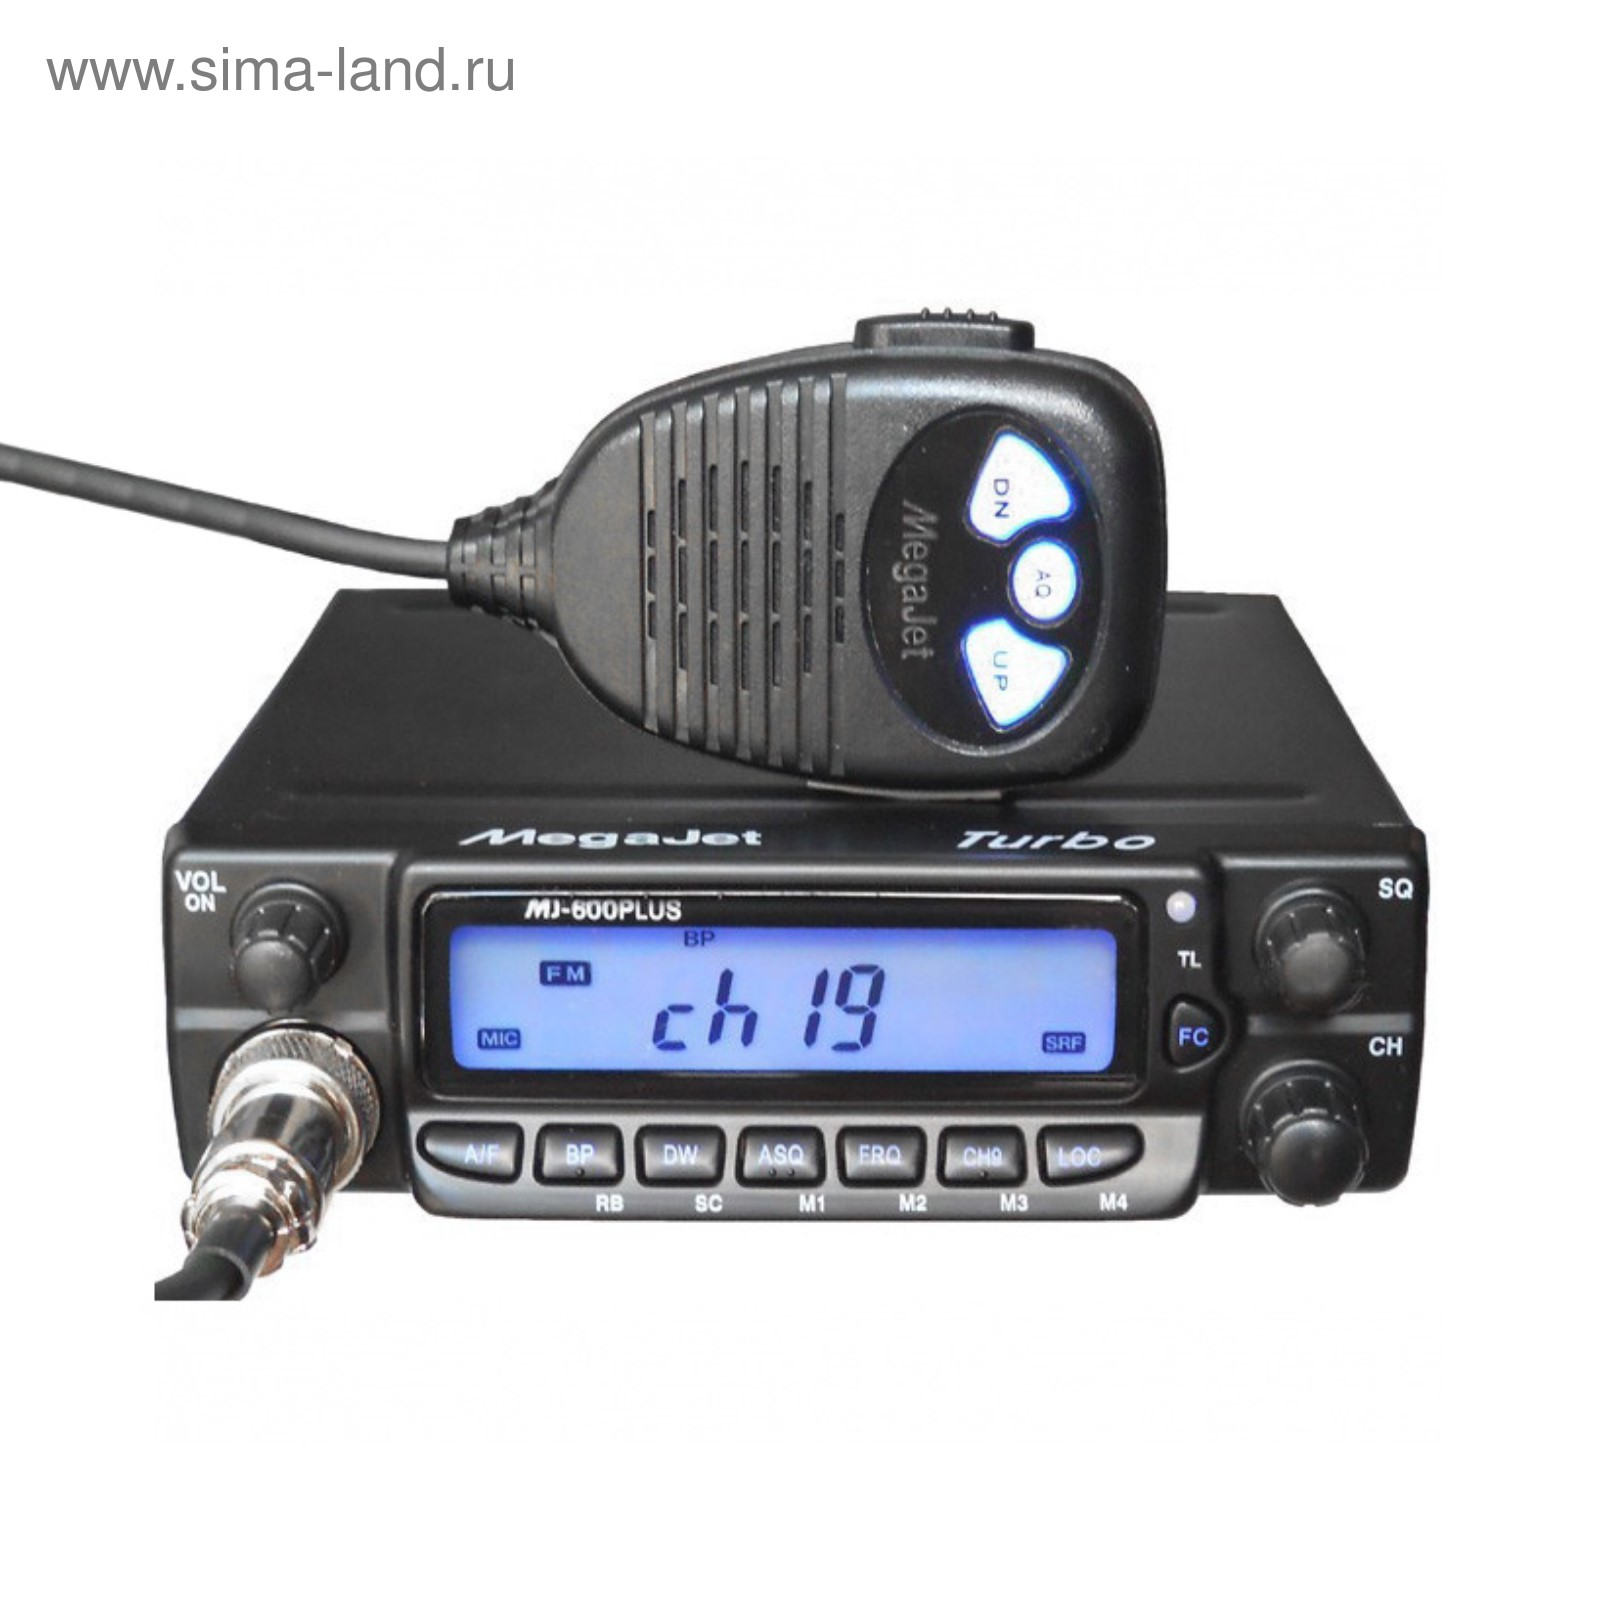 Megajet mj-600 plus turbo радиостанция | mj-600 рация.